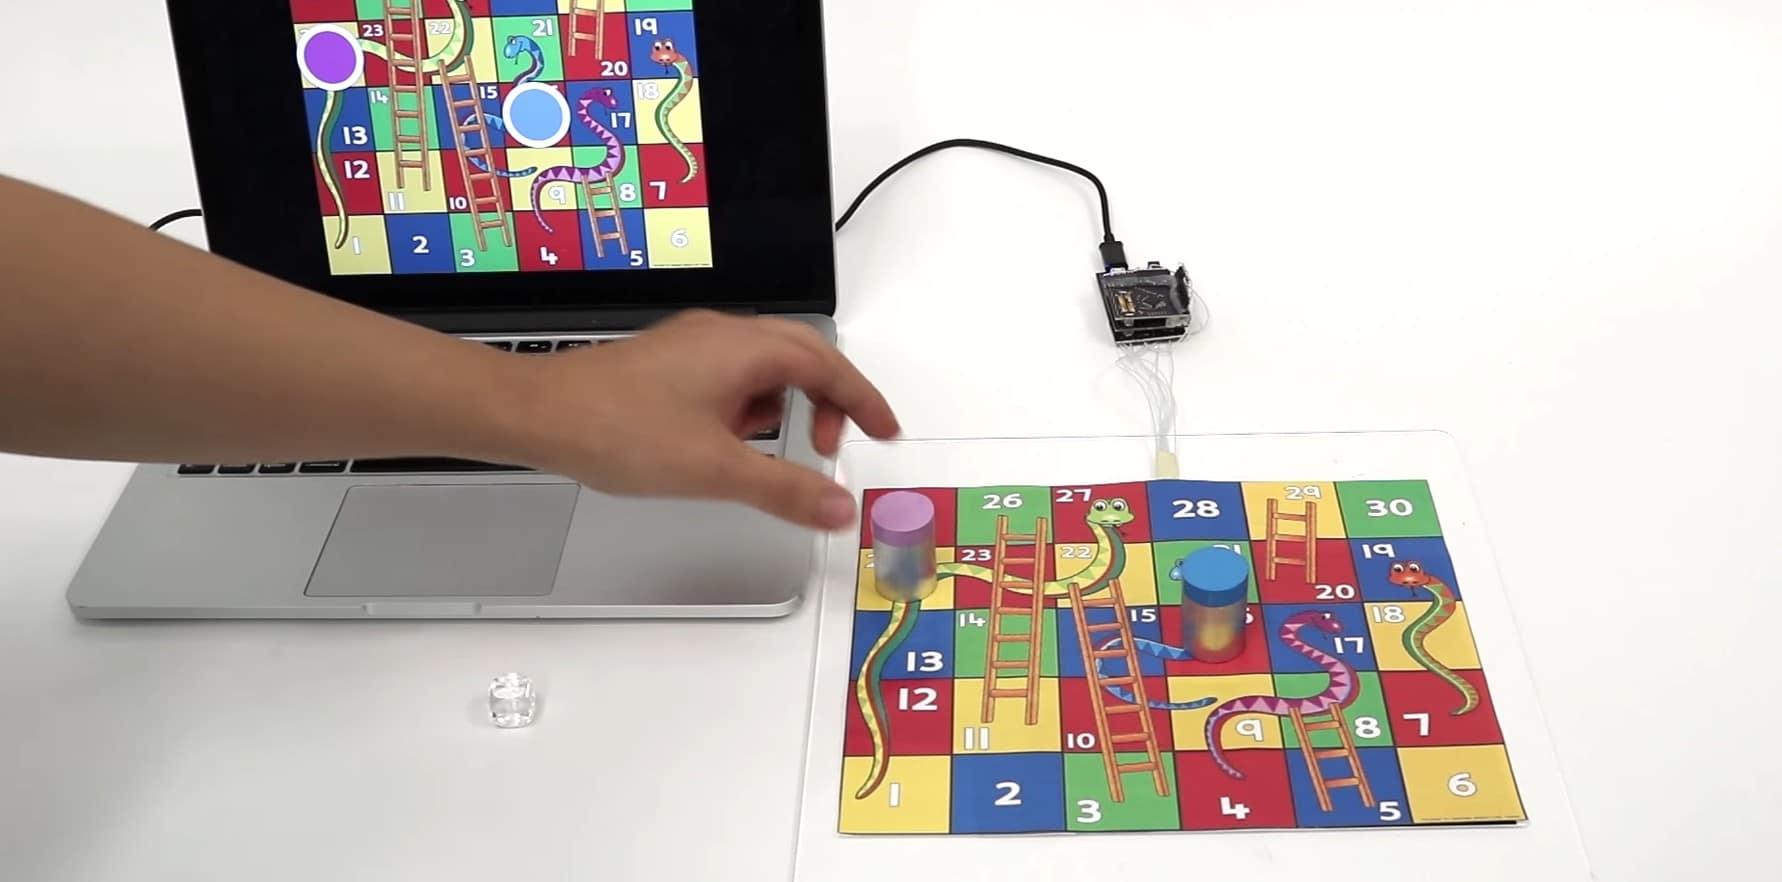 Papier wird interaktiv. (Foto: Screenshot / Youtube)